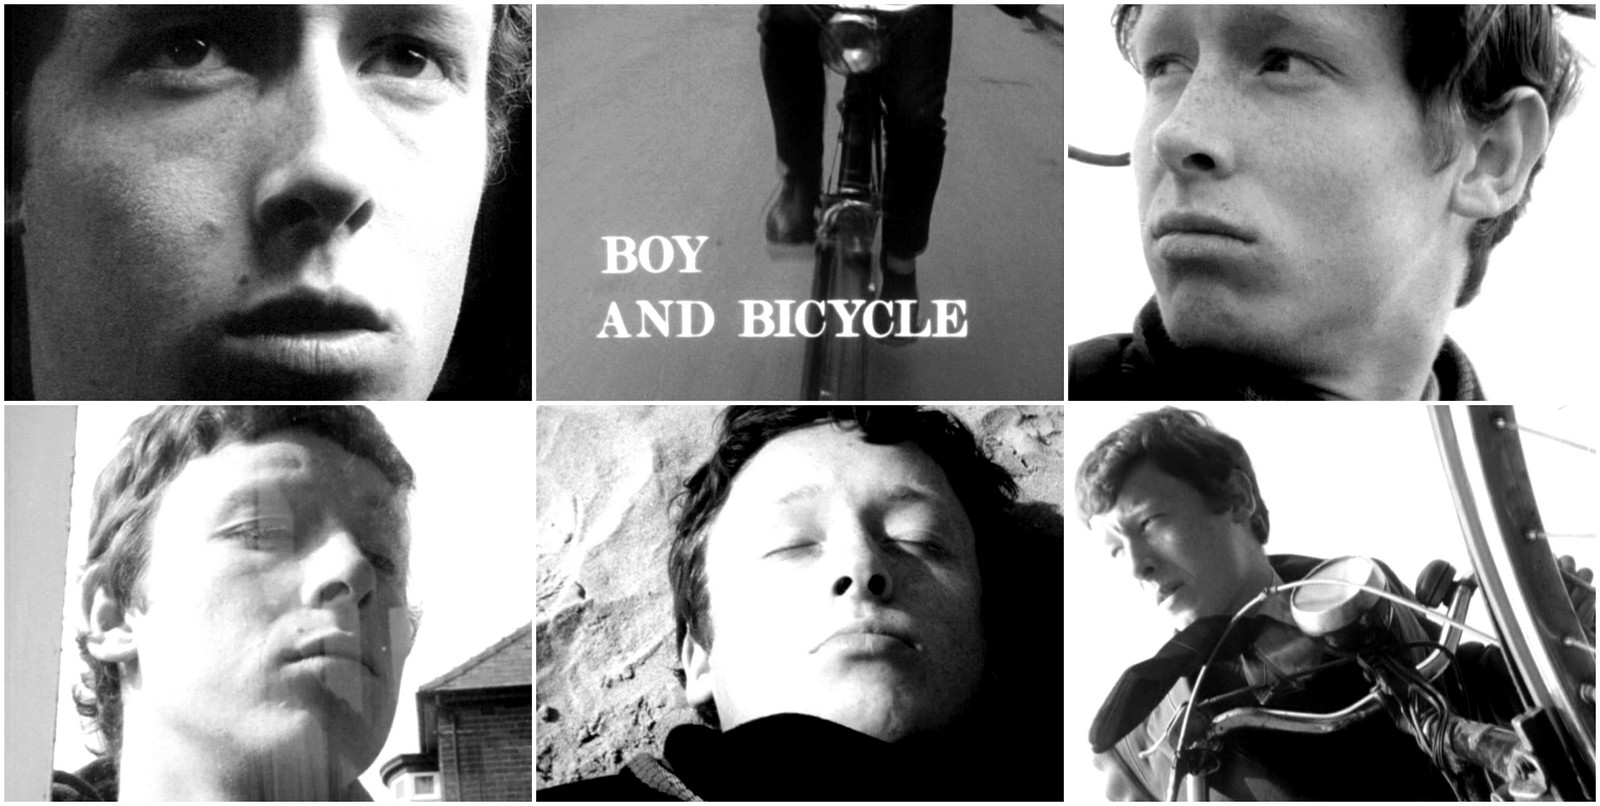 http://1.bp.blogspot.com/-RaThVbFbQWU/UJ-PdshOnwI/AAAAAAAAHHE/I-oux2EemDU/s1600/pere-koniec-boy-bicycle-tony-scott.jpg